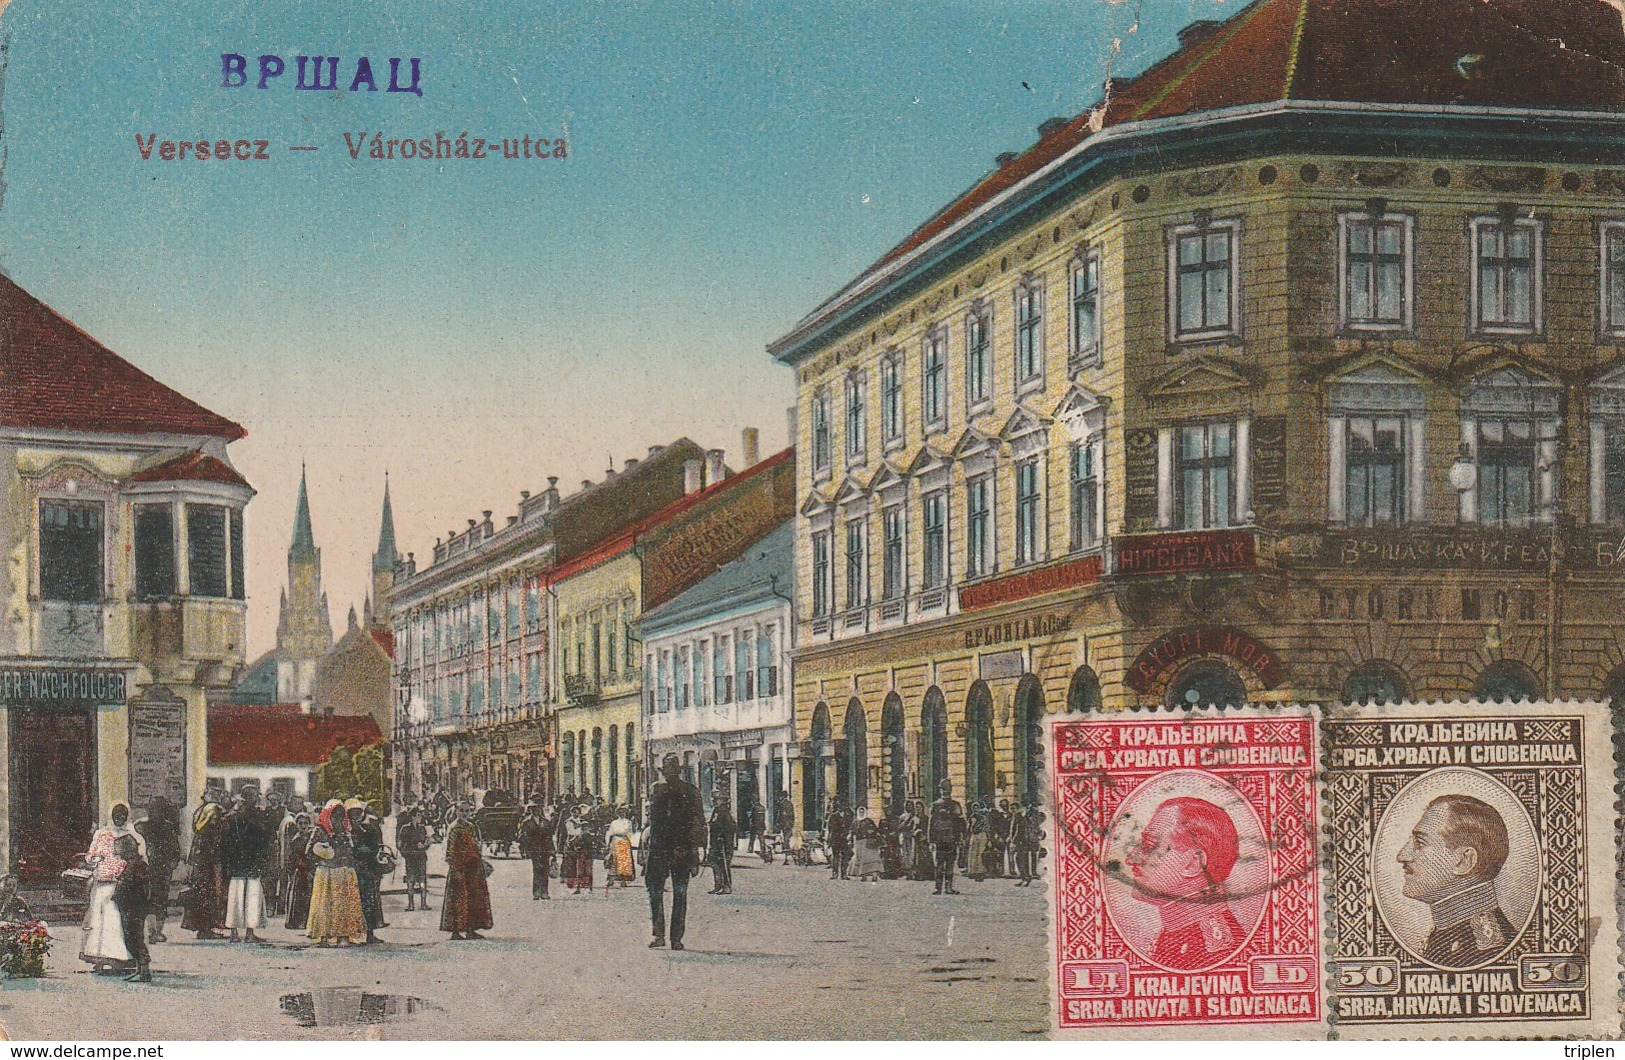 Versecz - Varoshaz-utca - Rathausgasse - Serbie